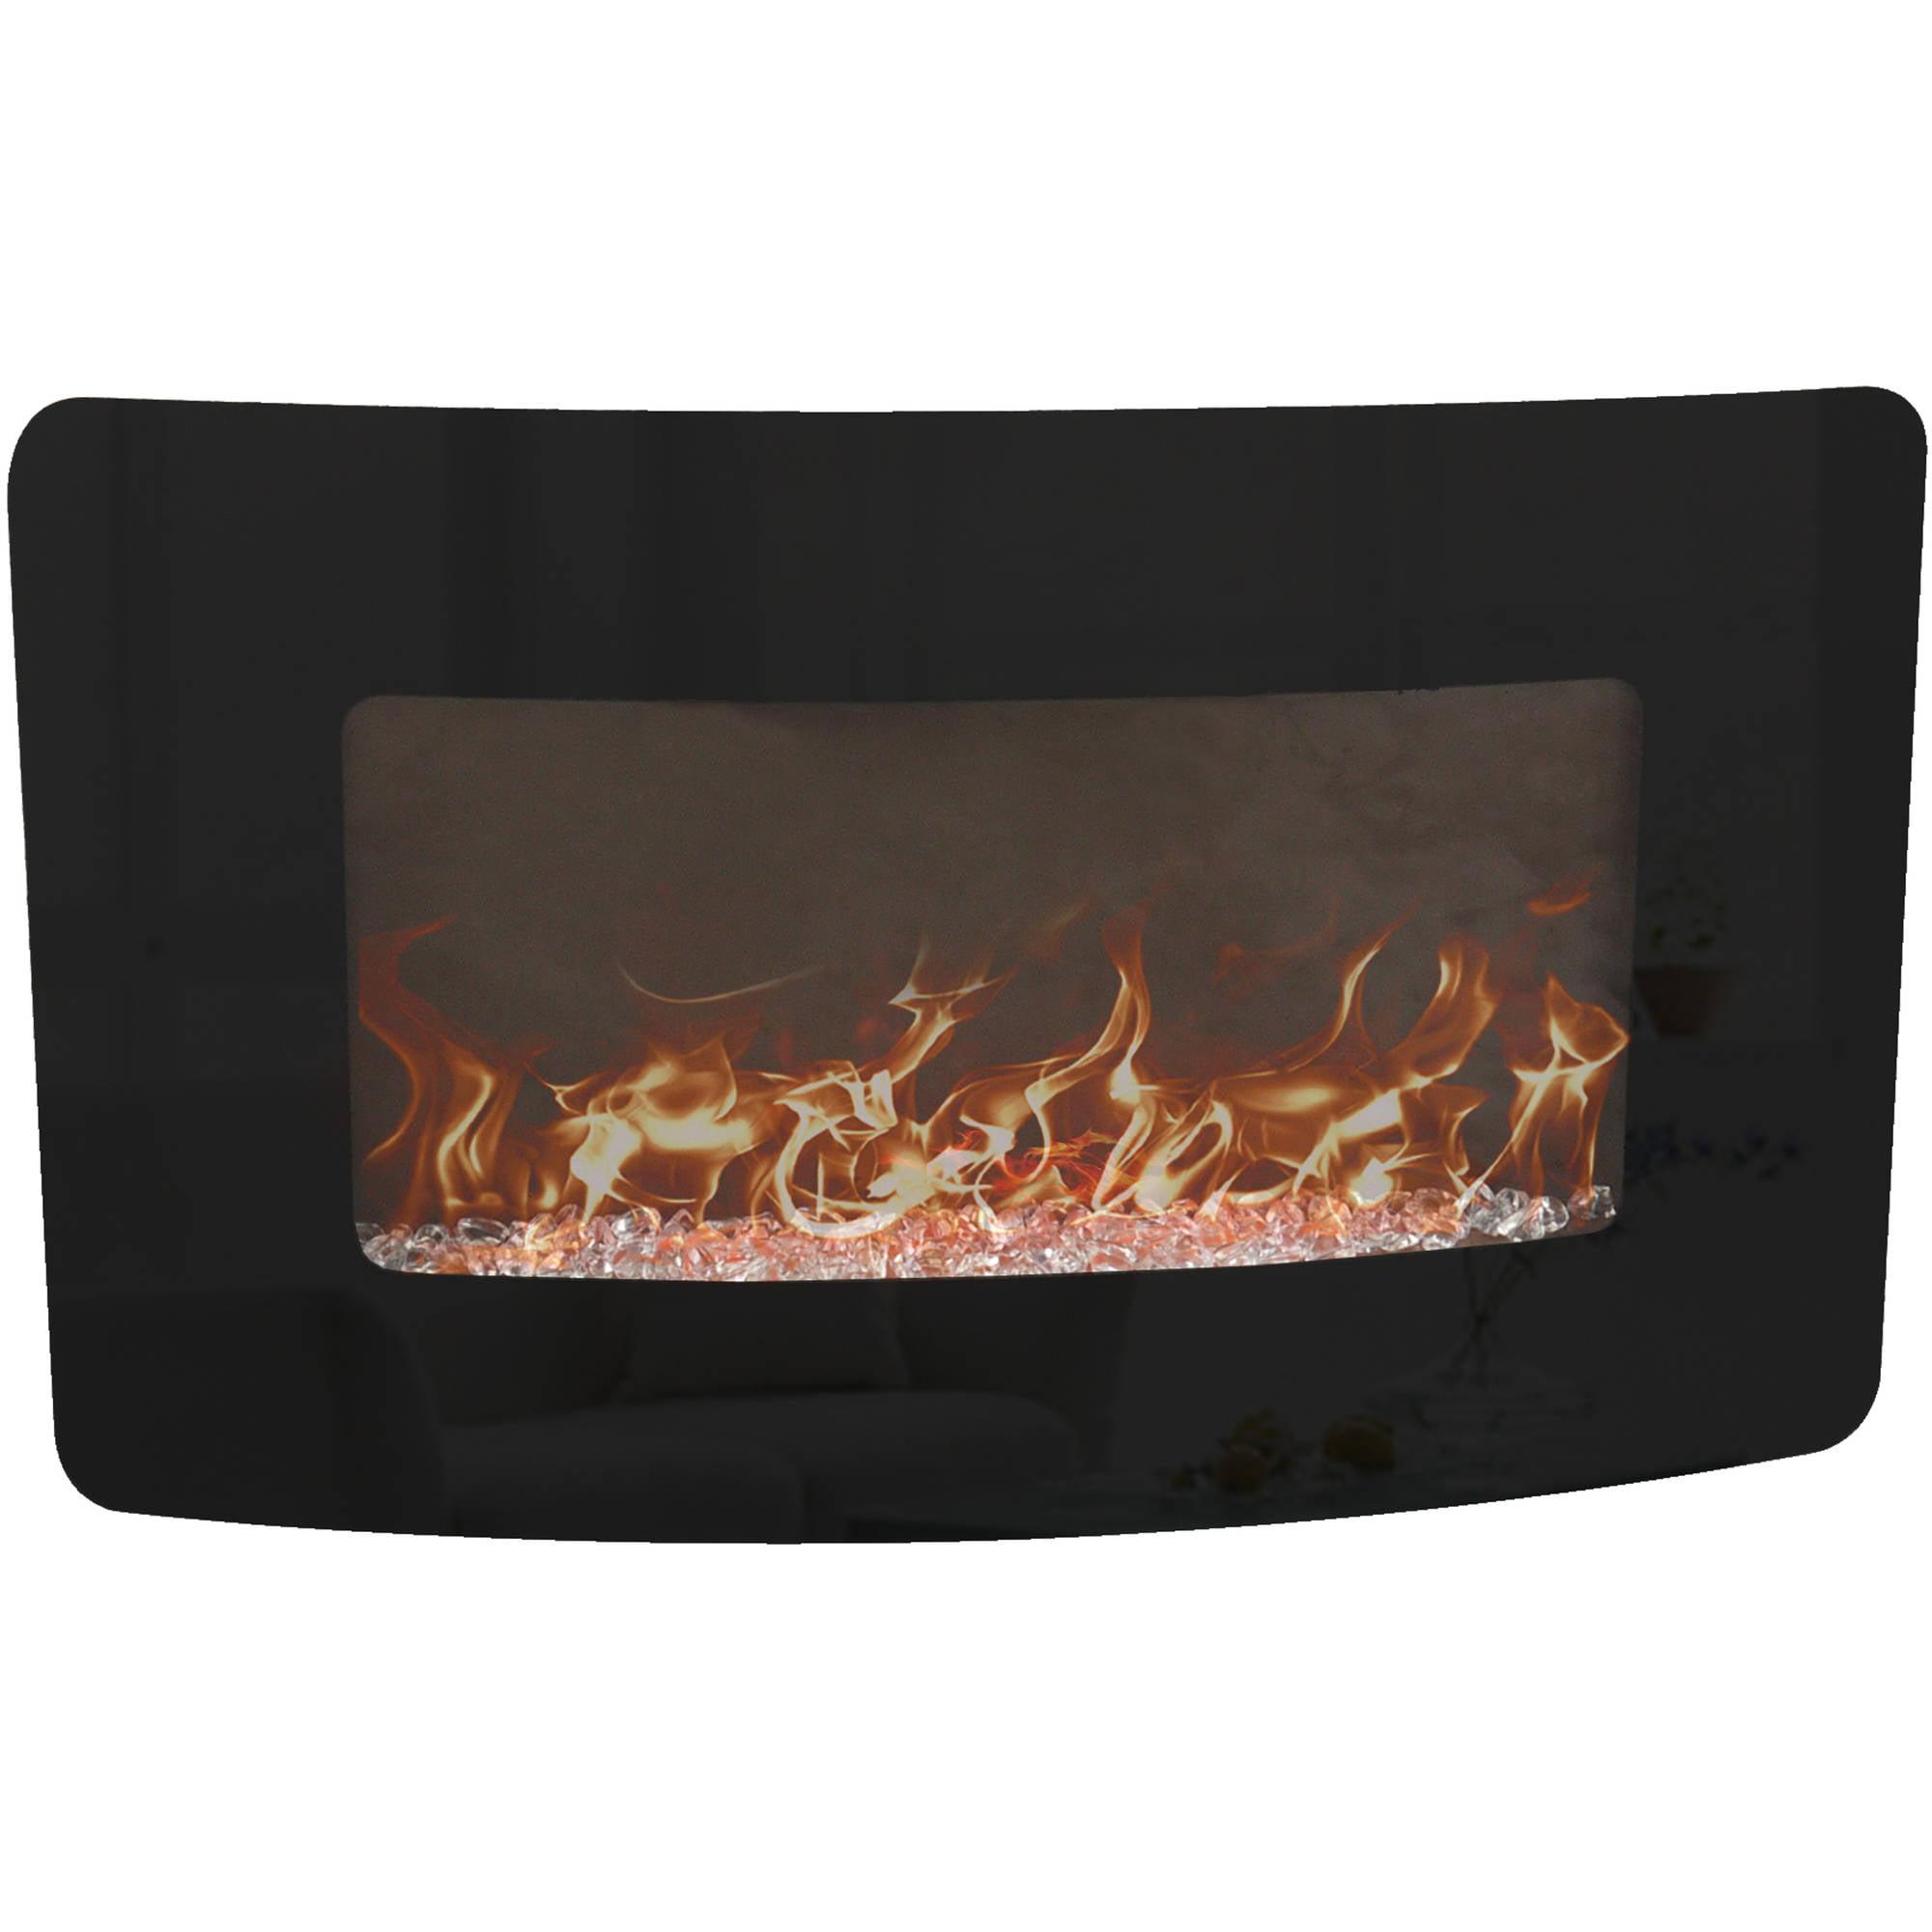 159 99 Flametec 750w 1500w 3d Flame Electric Fireplace